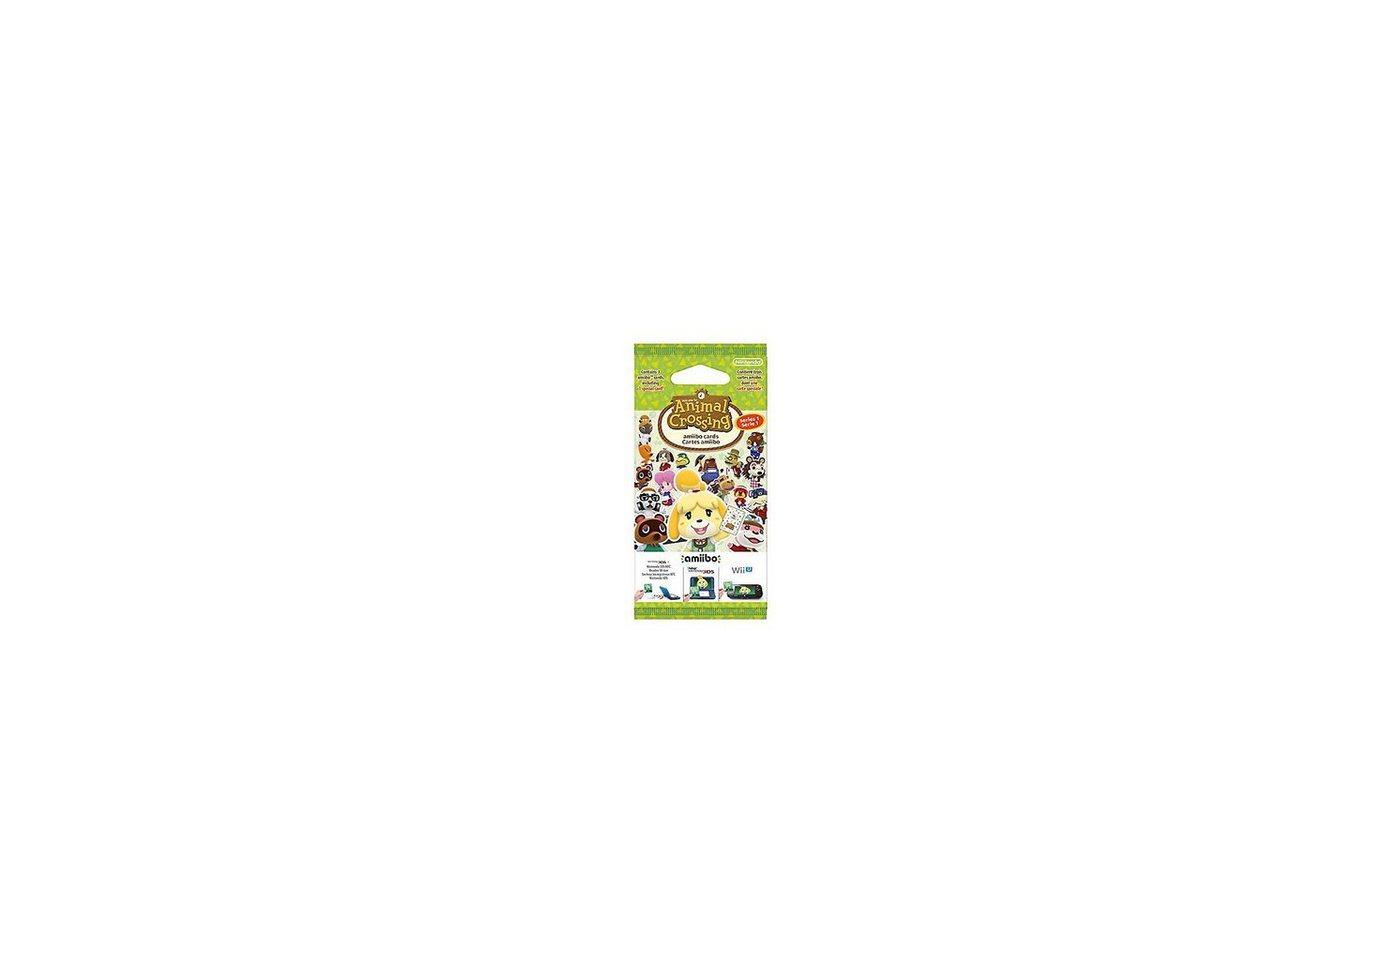 Nintendo amiibo Karten für Animal Crossing, 3 Stück - Vol. 1